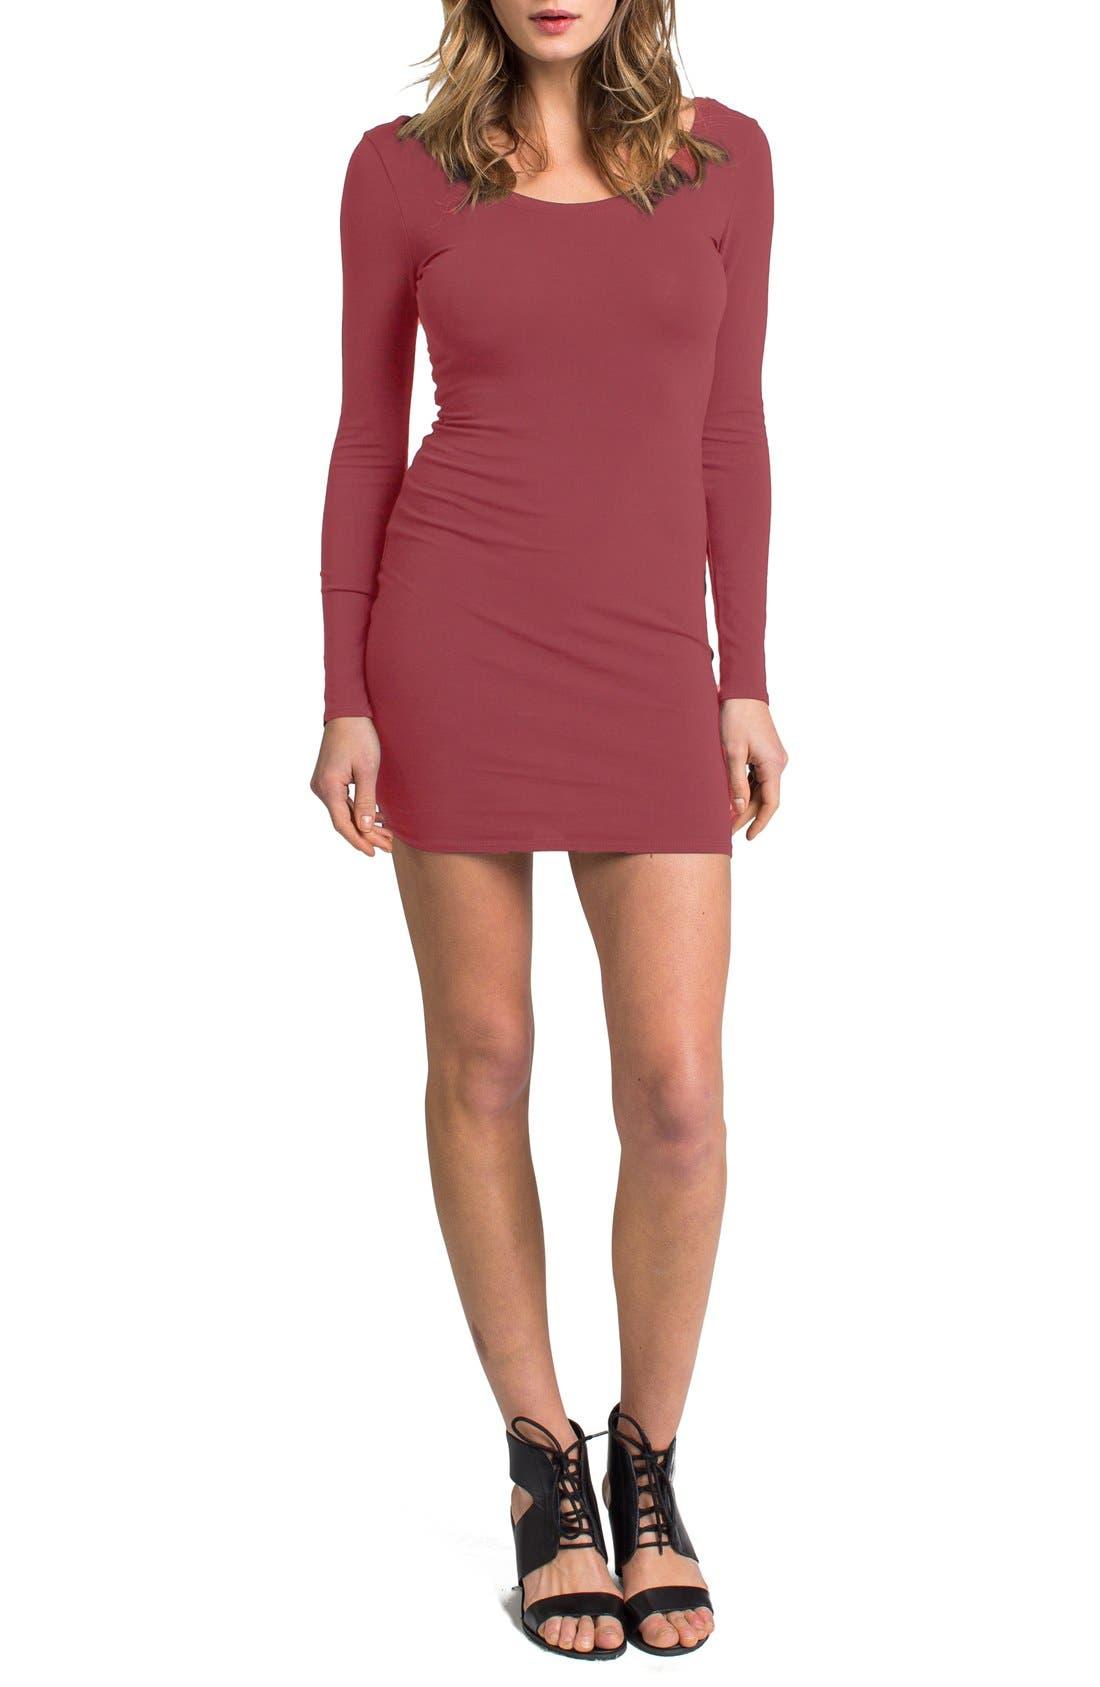 Alternate Image 1 Selected - LAmade Long Sleeve Knit Body-Con Dress